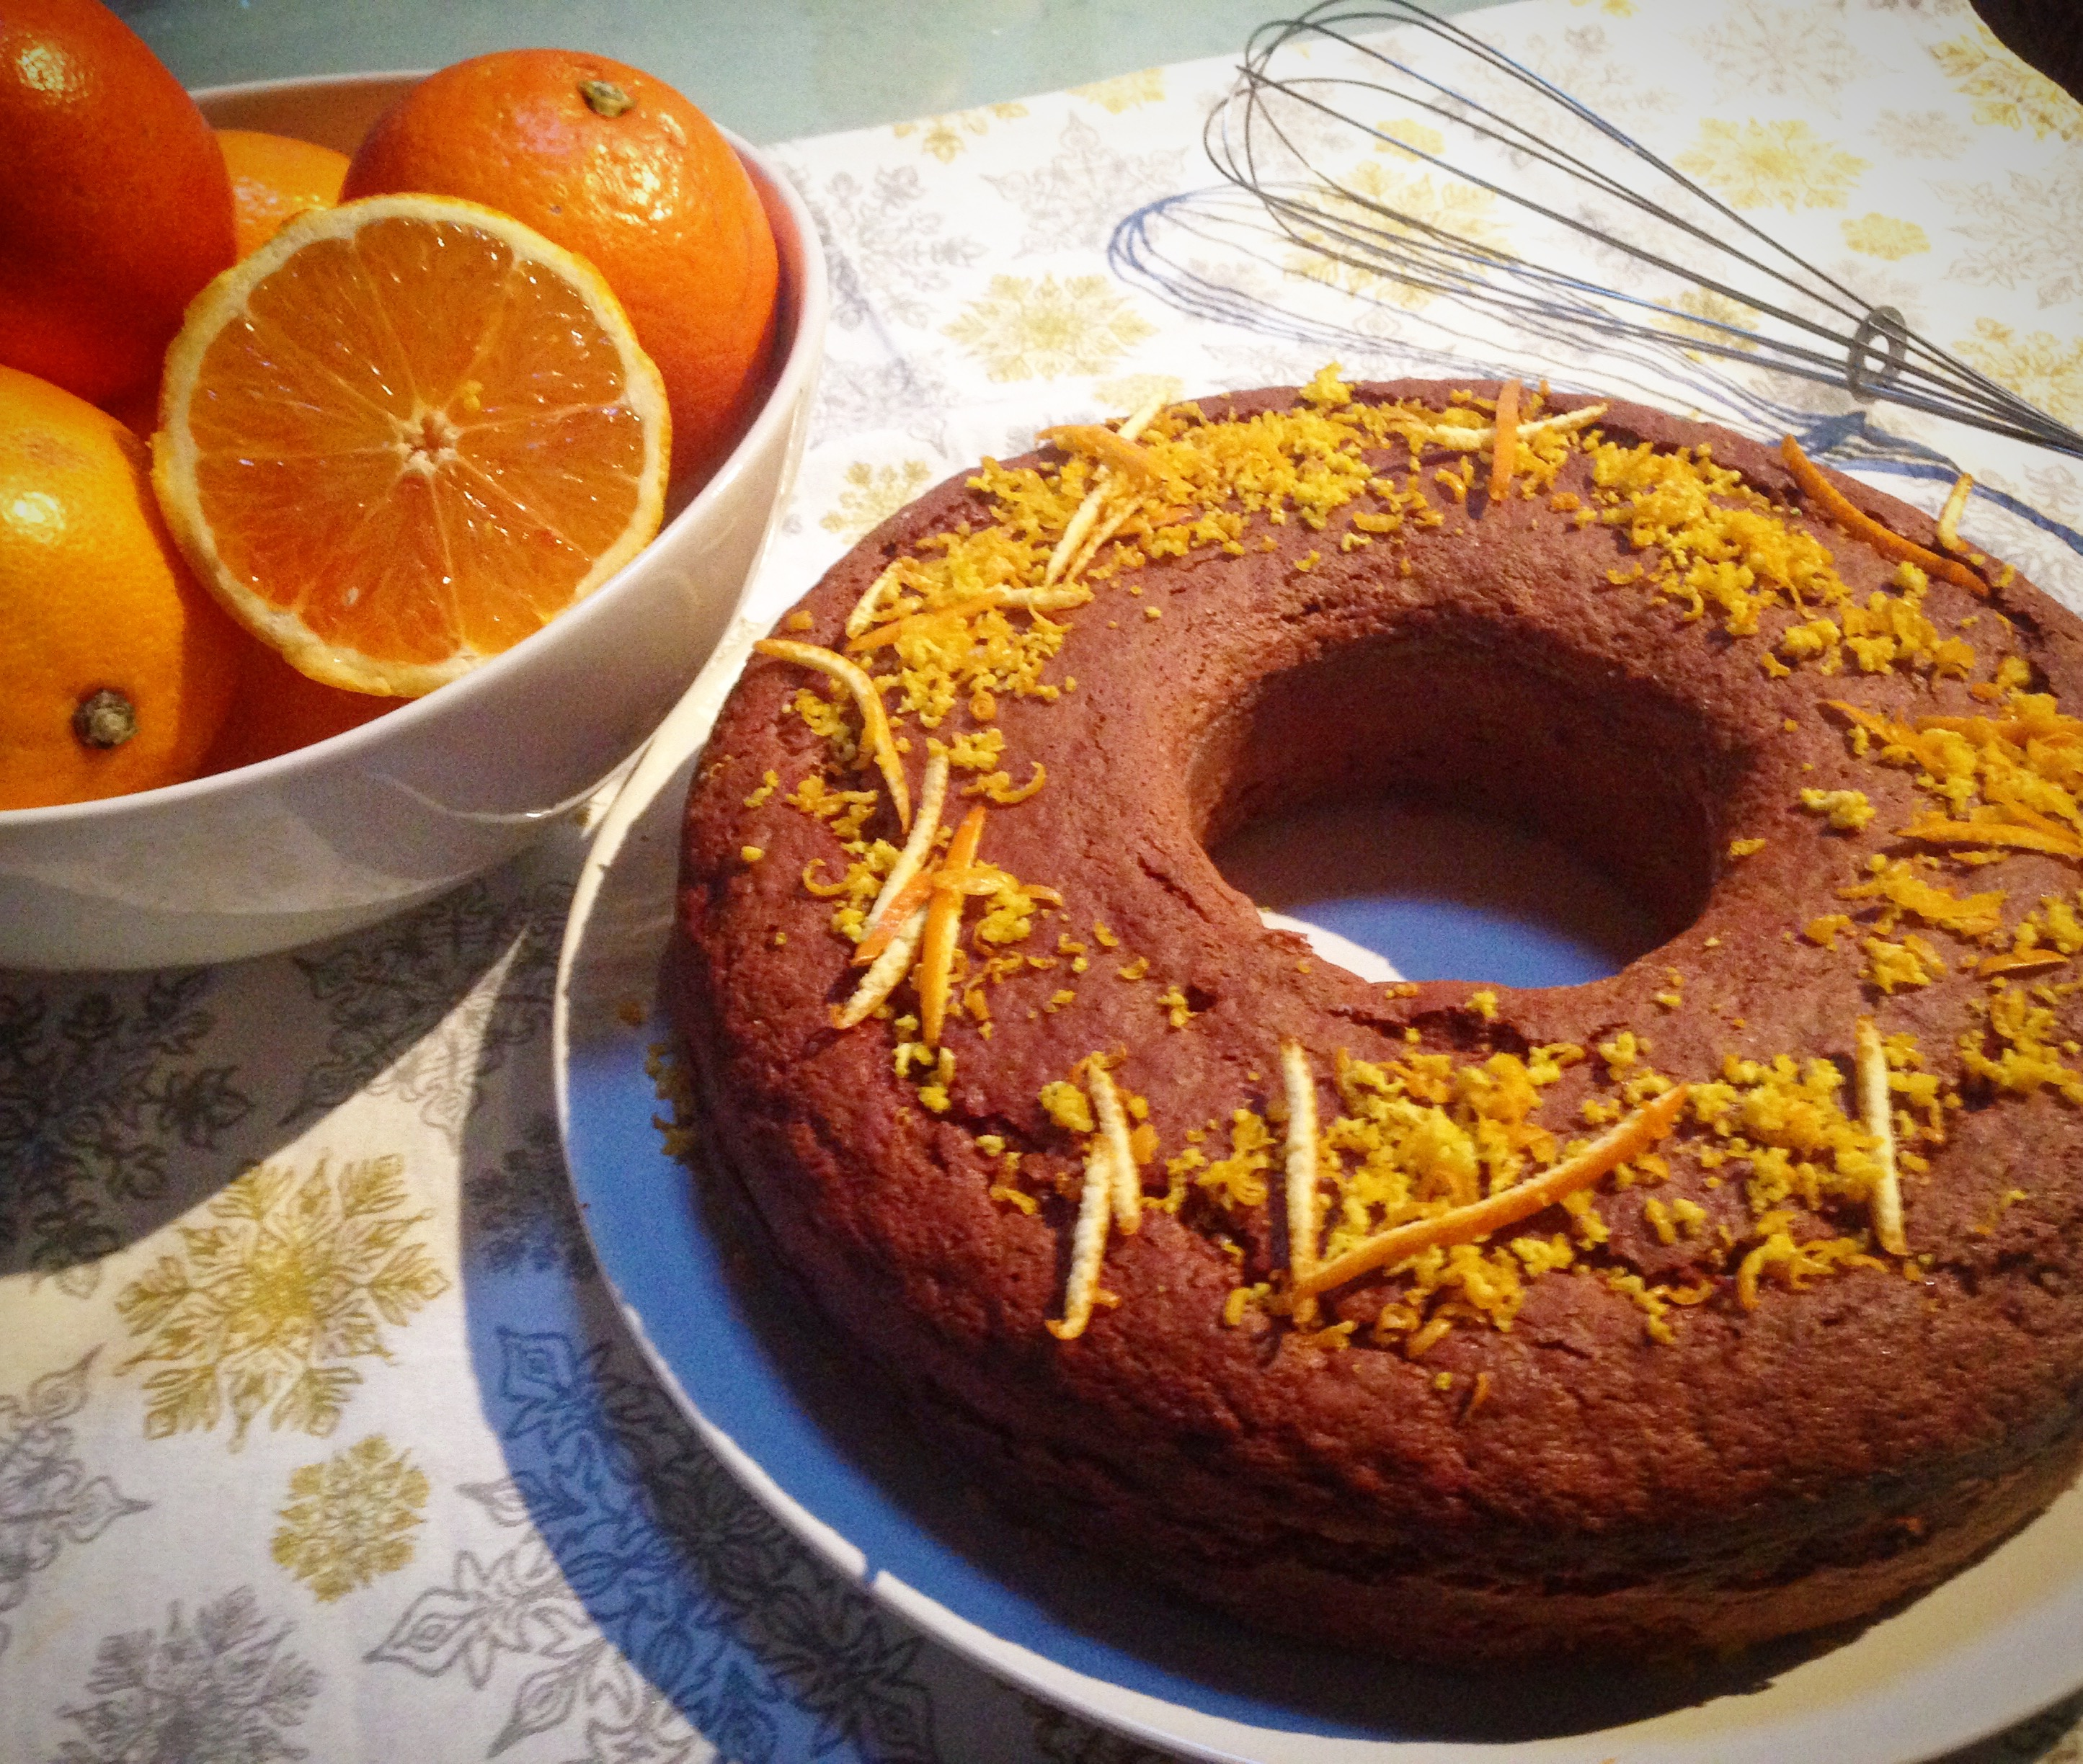 Torta al cioccolato profumata all'arancia